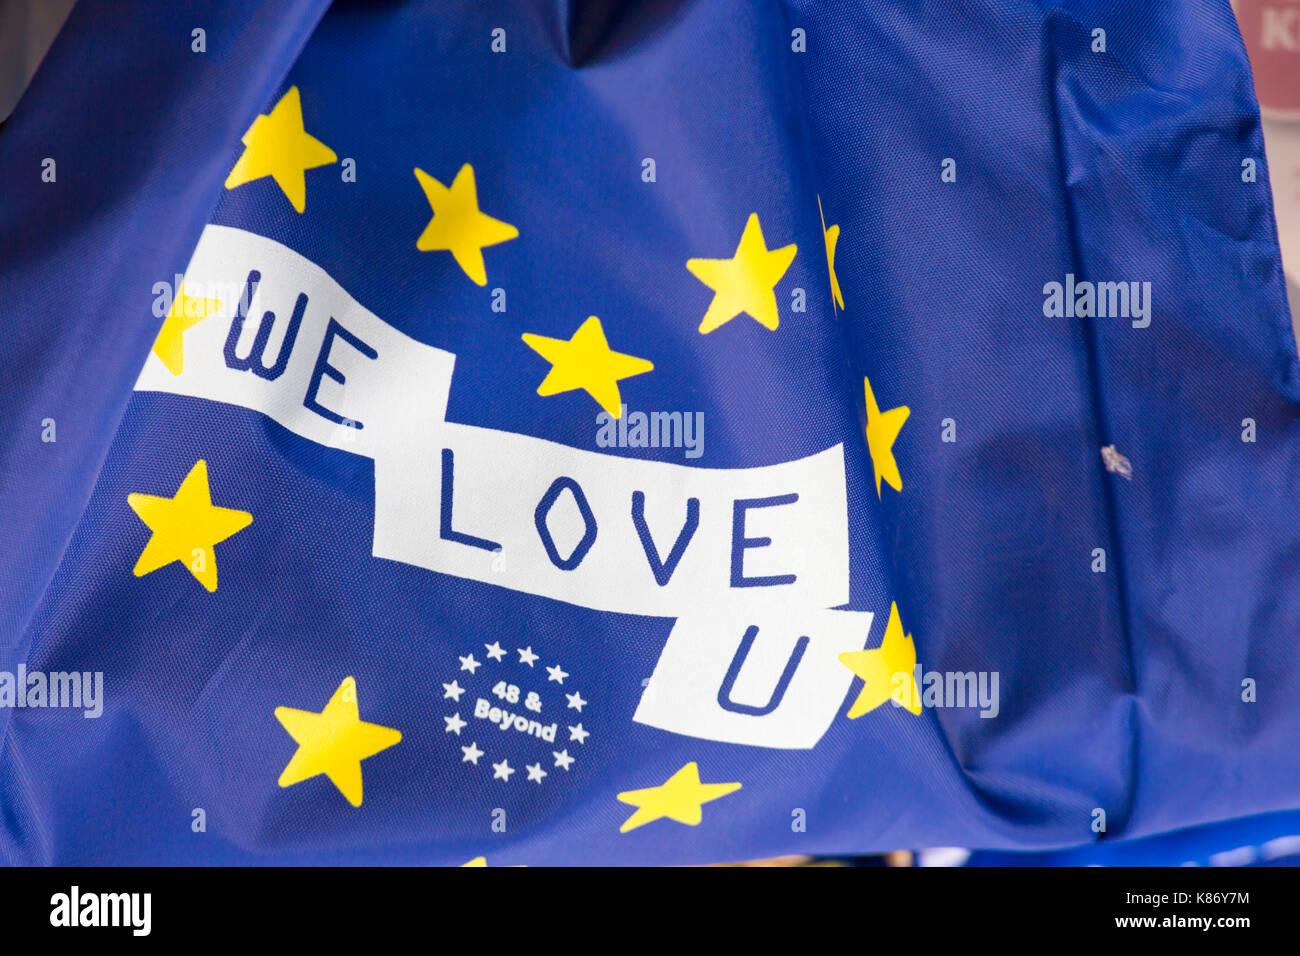 We Love U flag 48 & Beyond at Stop Brexit Demonstration at Bournemouth, Dorset in September - Stock Image